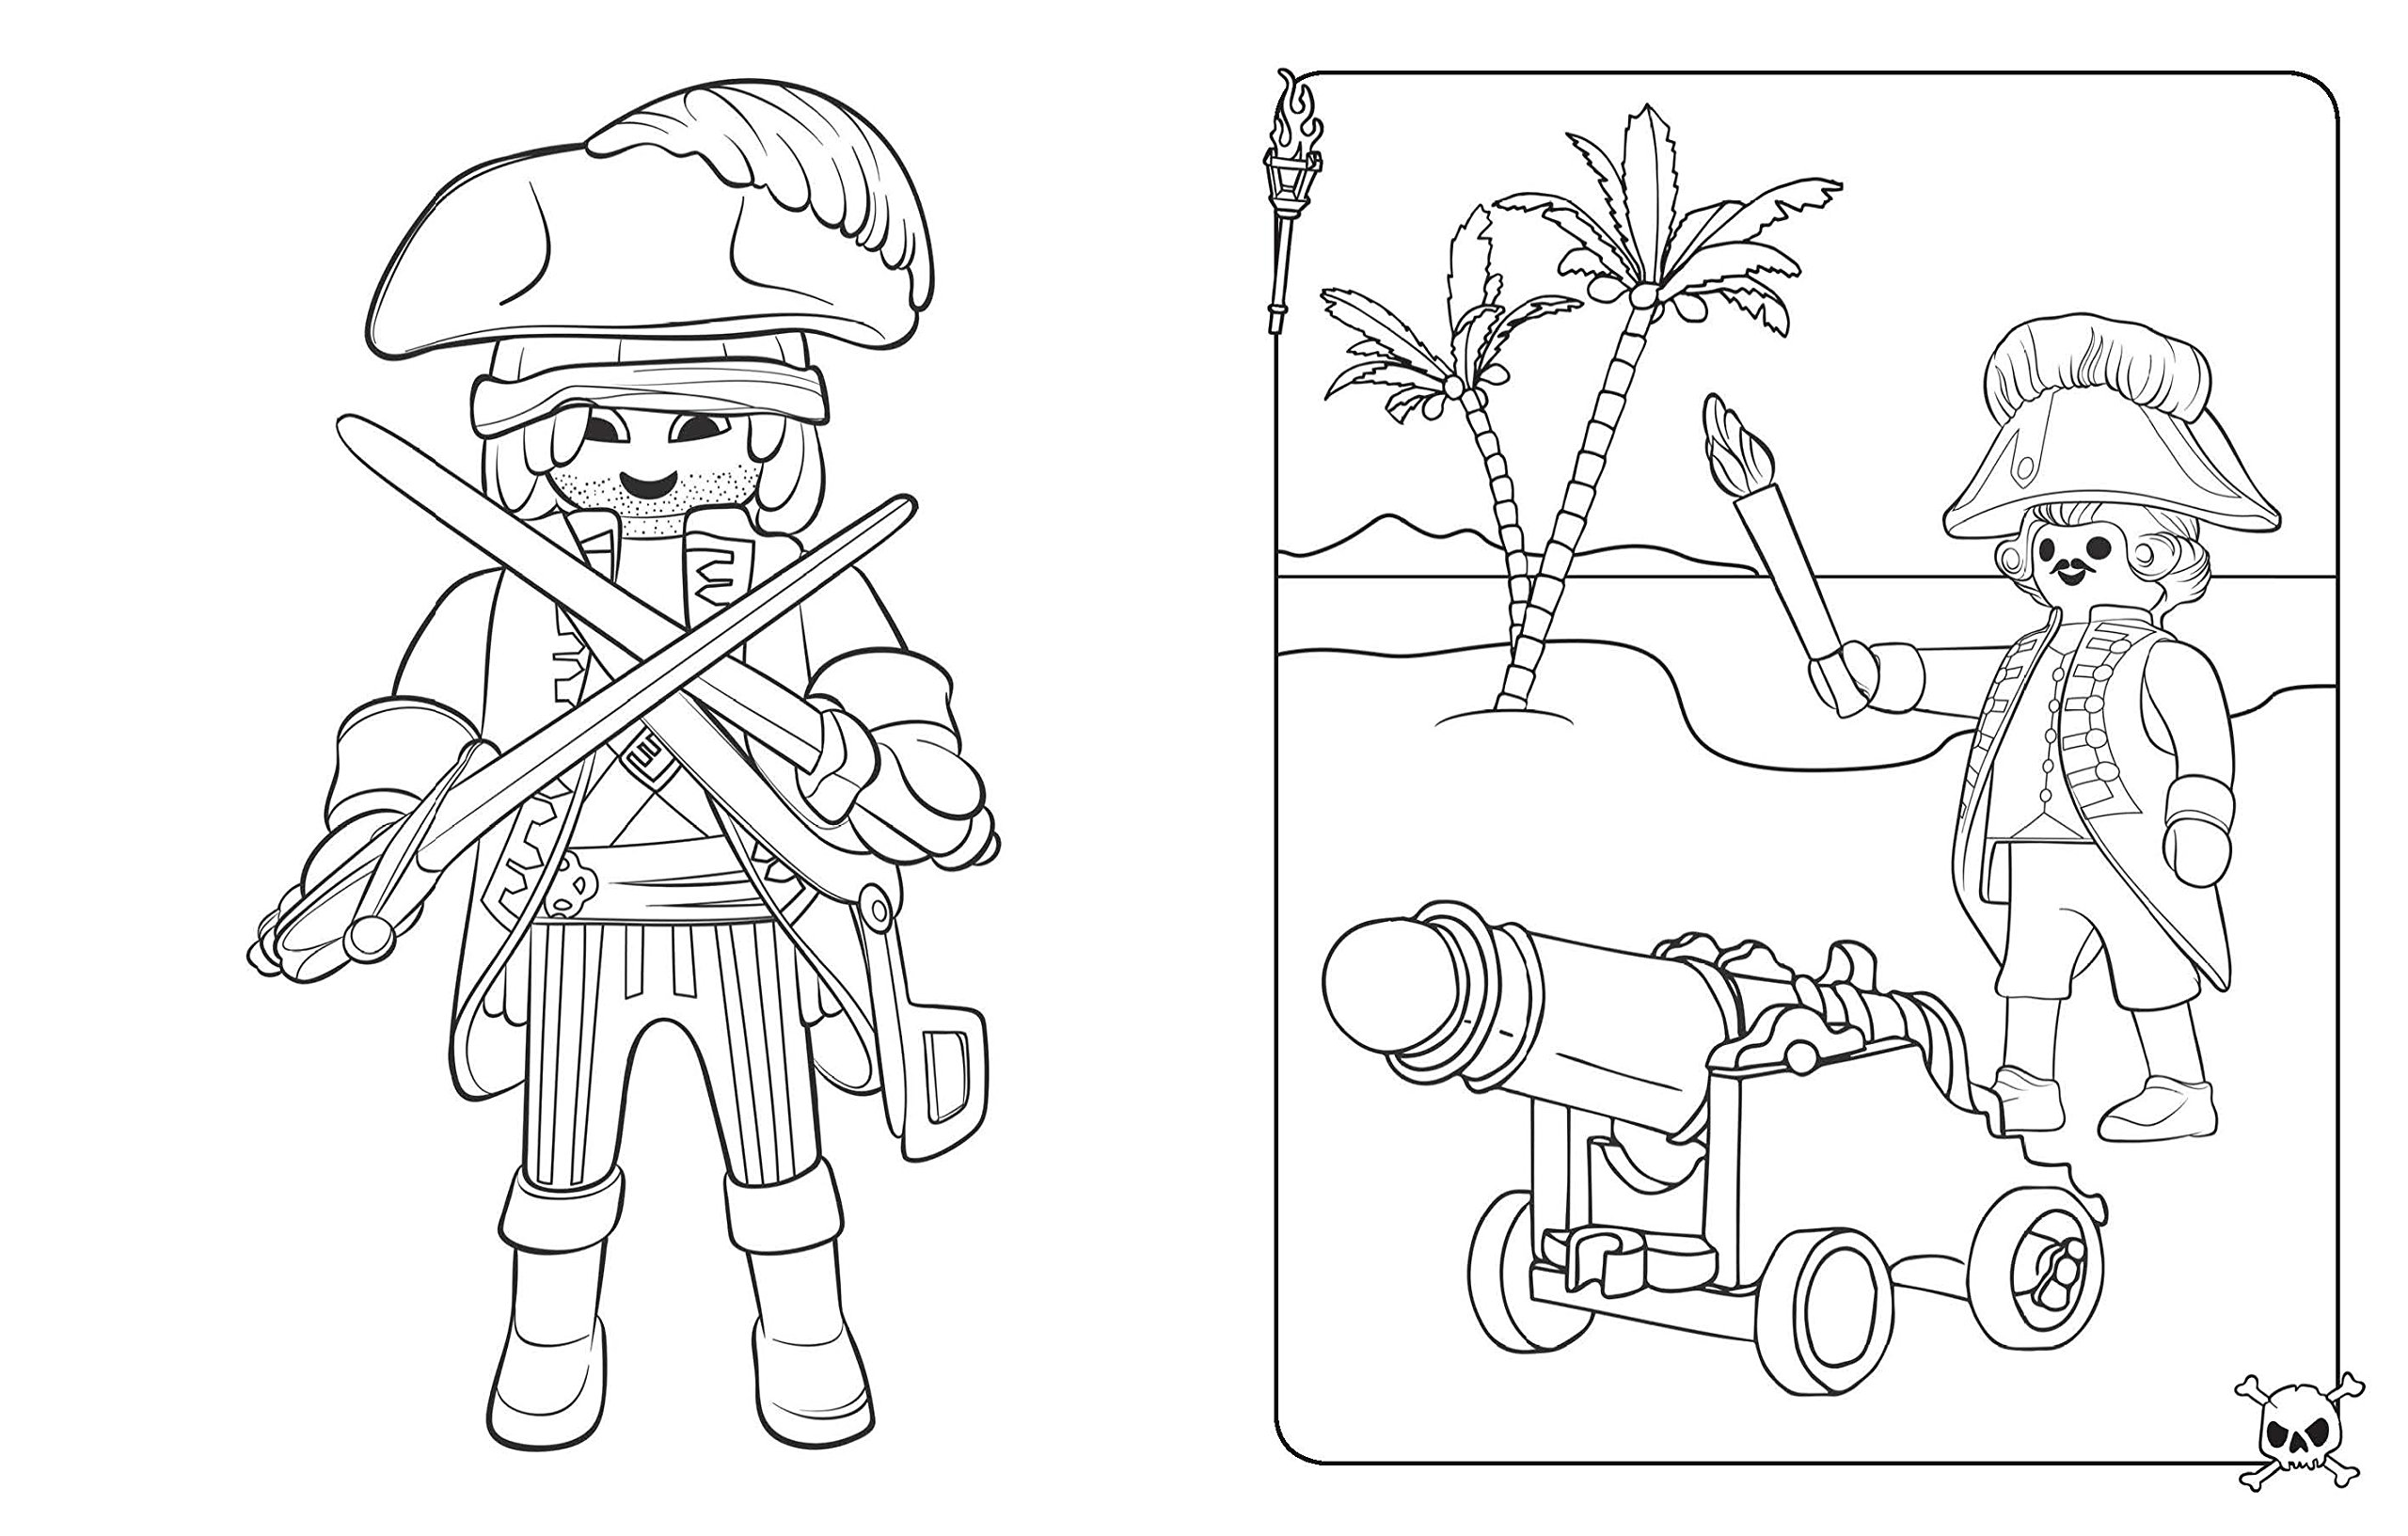 Playmobil Mega Malspaß für Jungen: 8: Amazon.com: Books